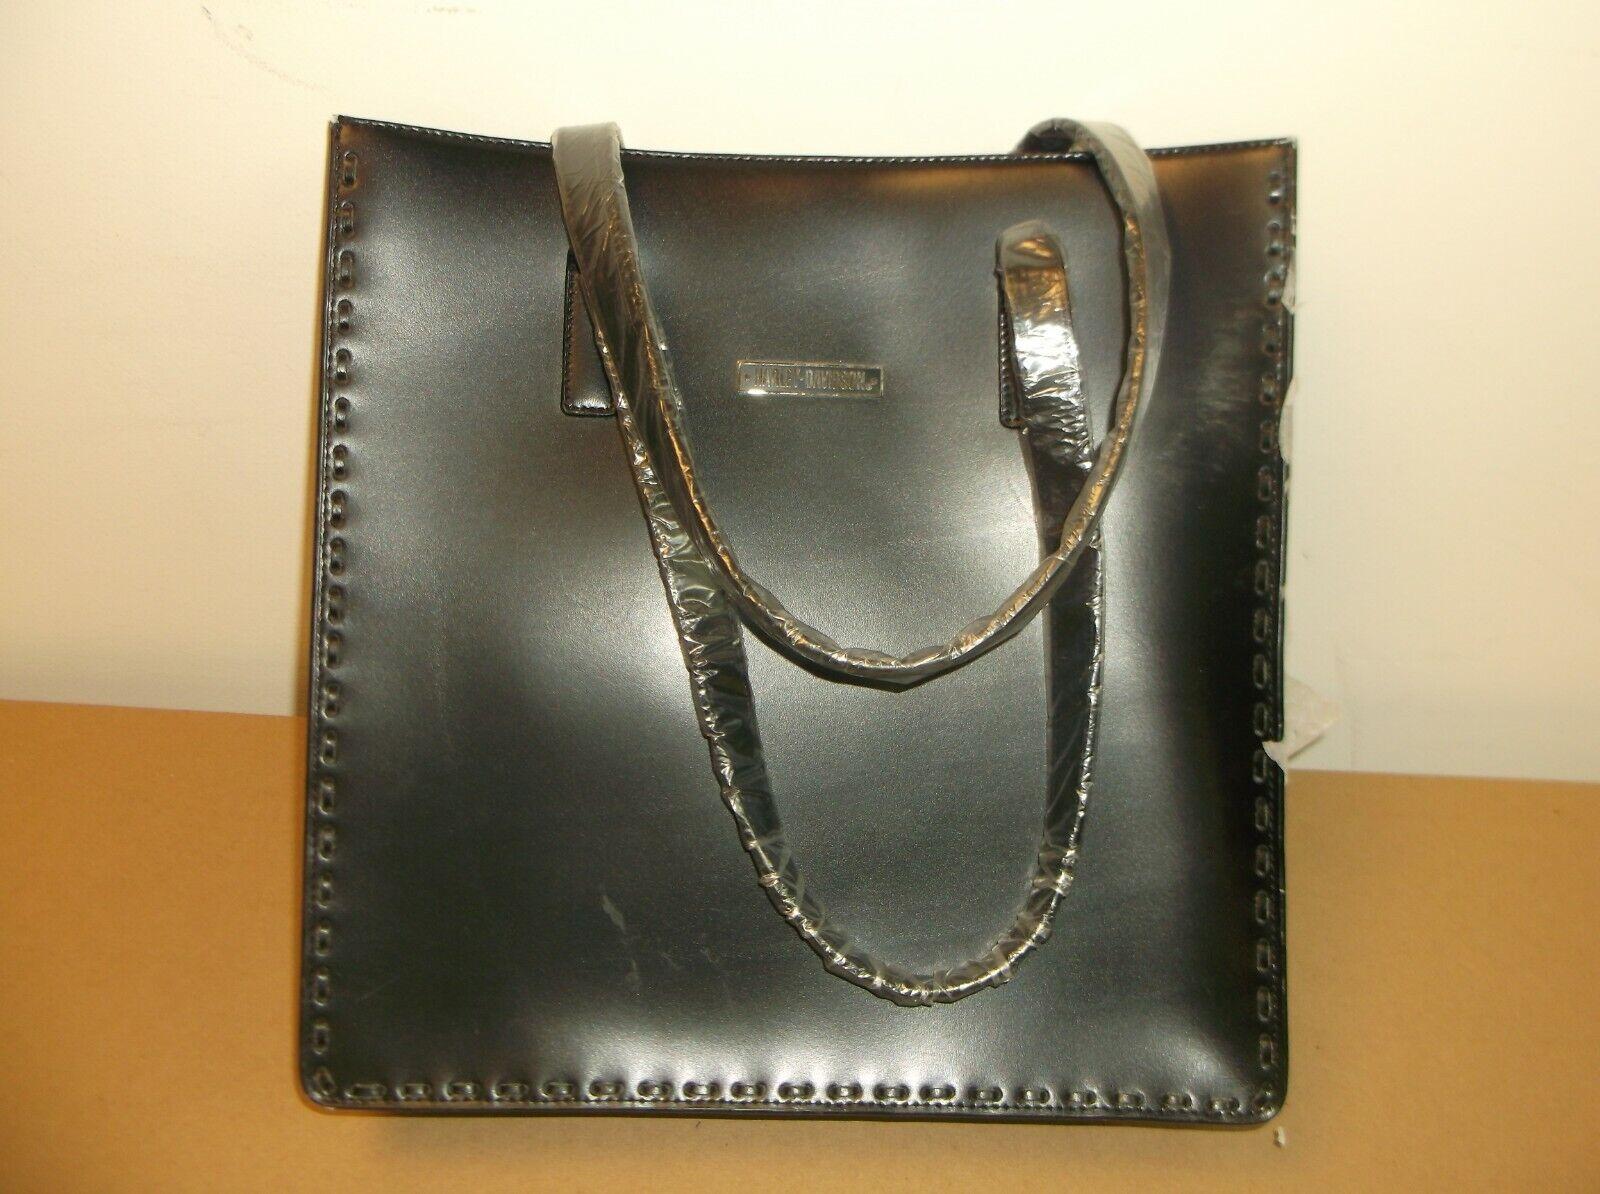 "Harley-Davidson Women's Leather Tote purse 12.5"" x 12.5"" x 3"